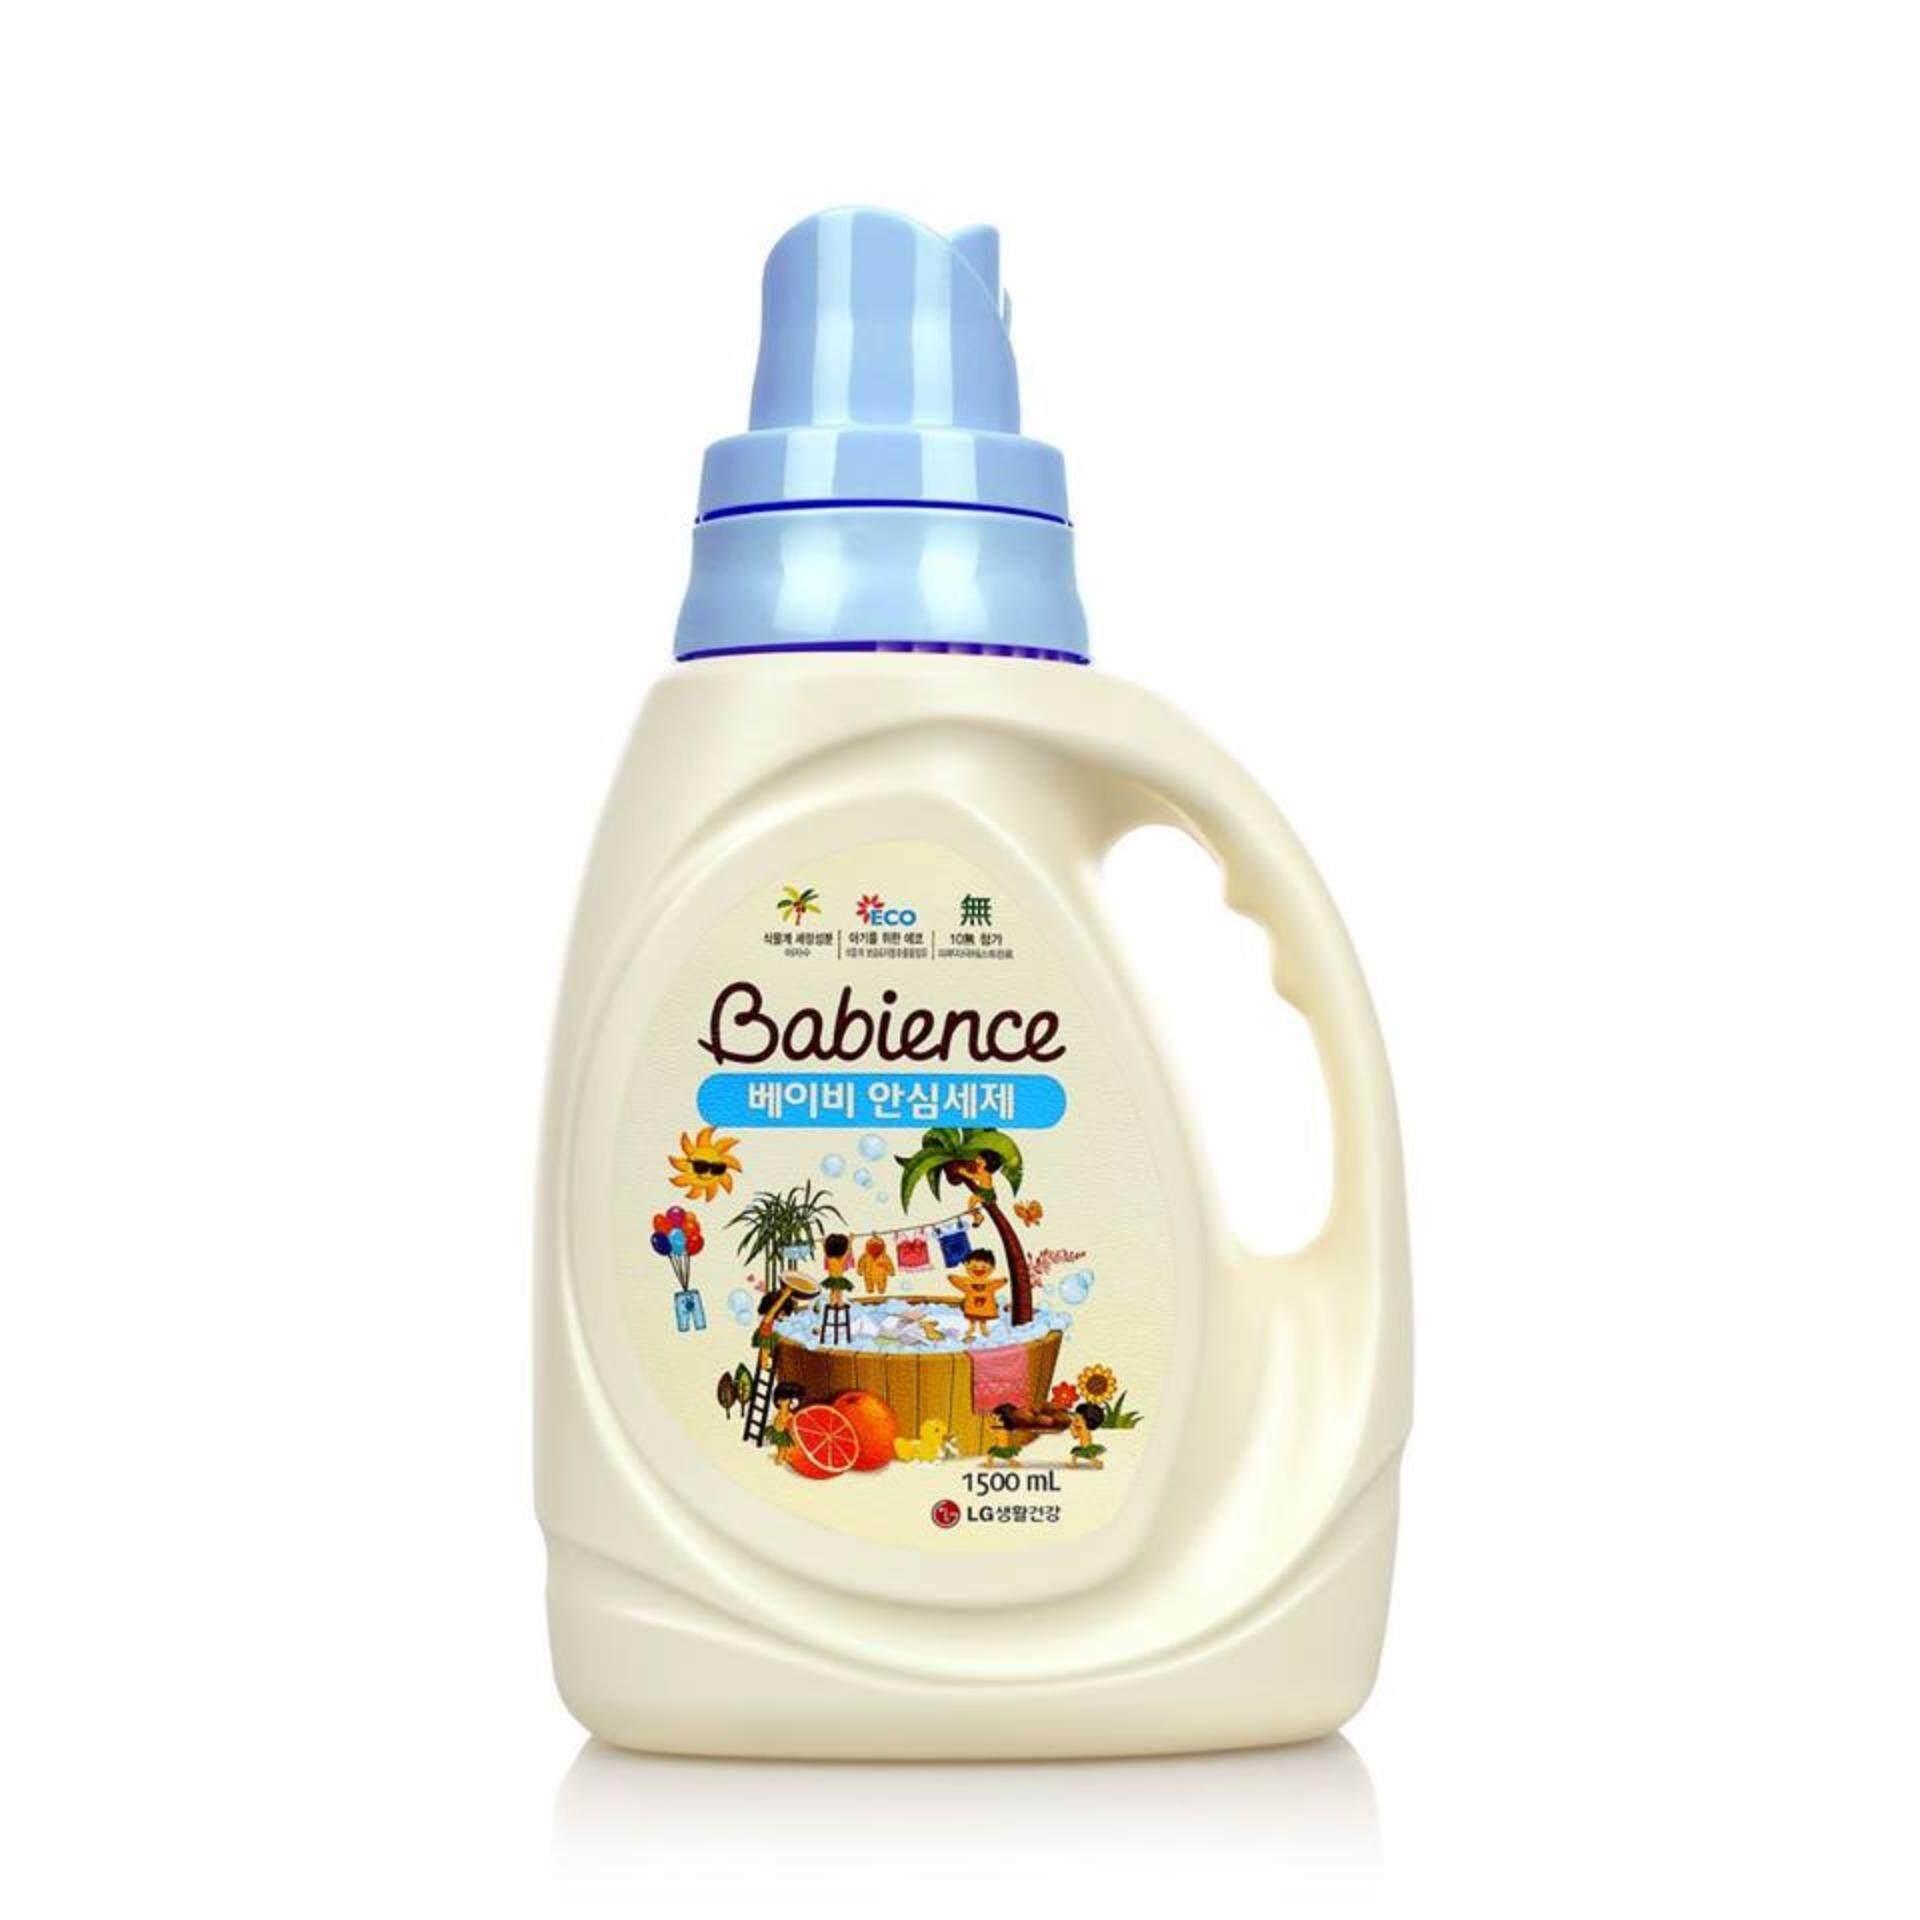 LG Babience Detergent 1500ml